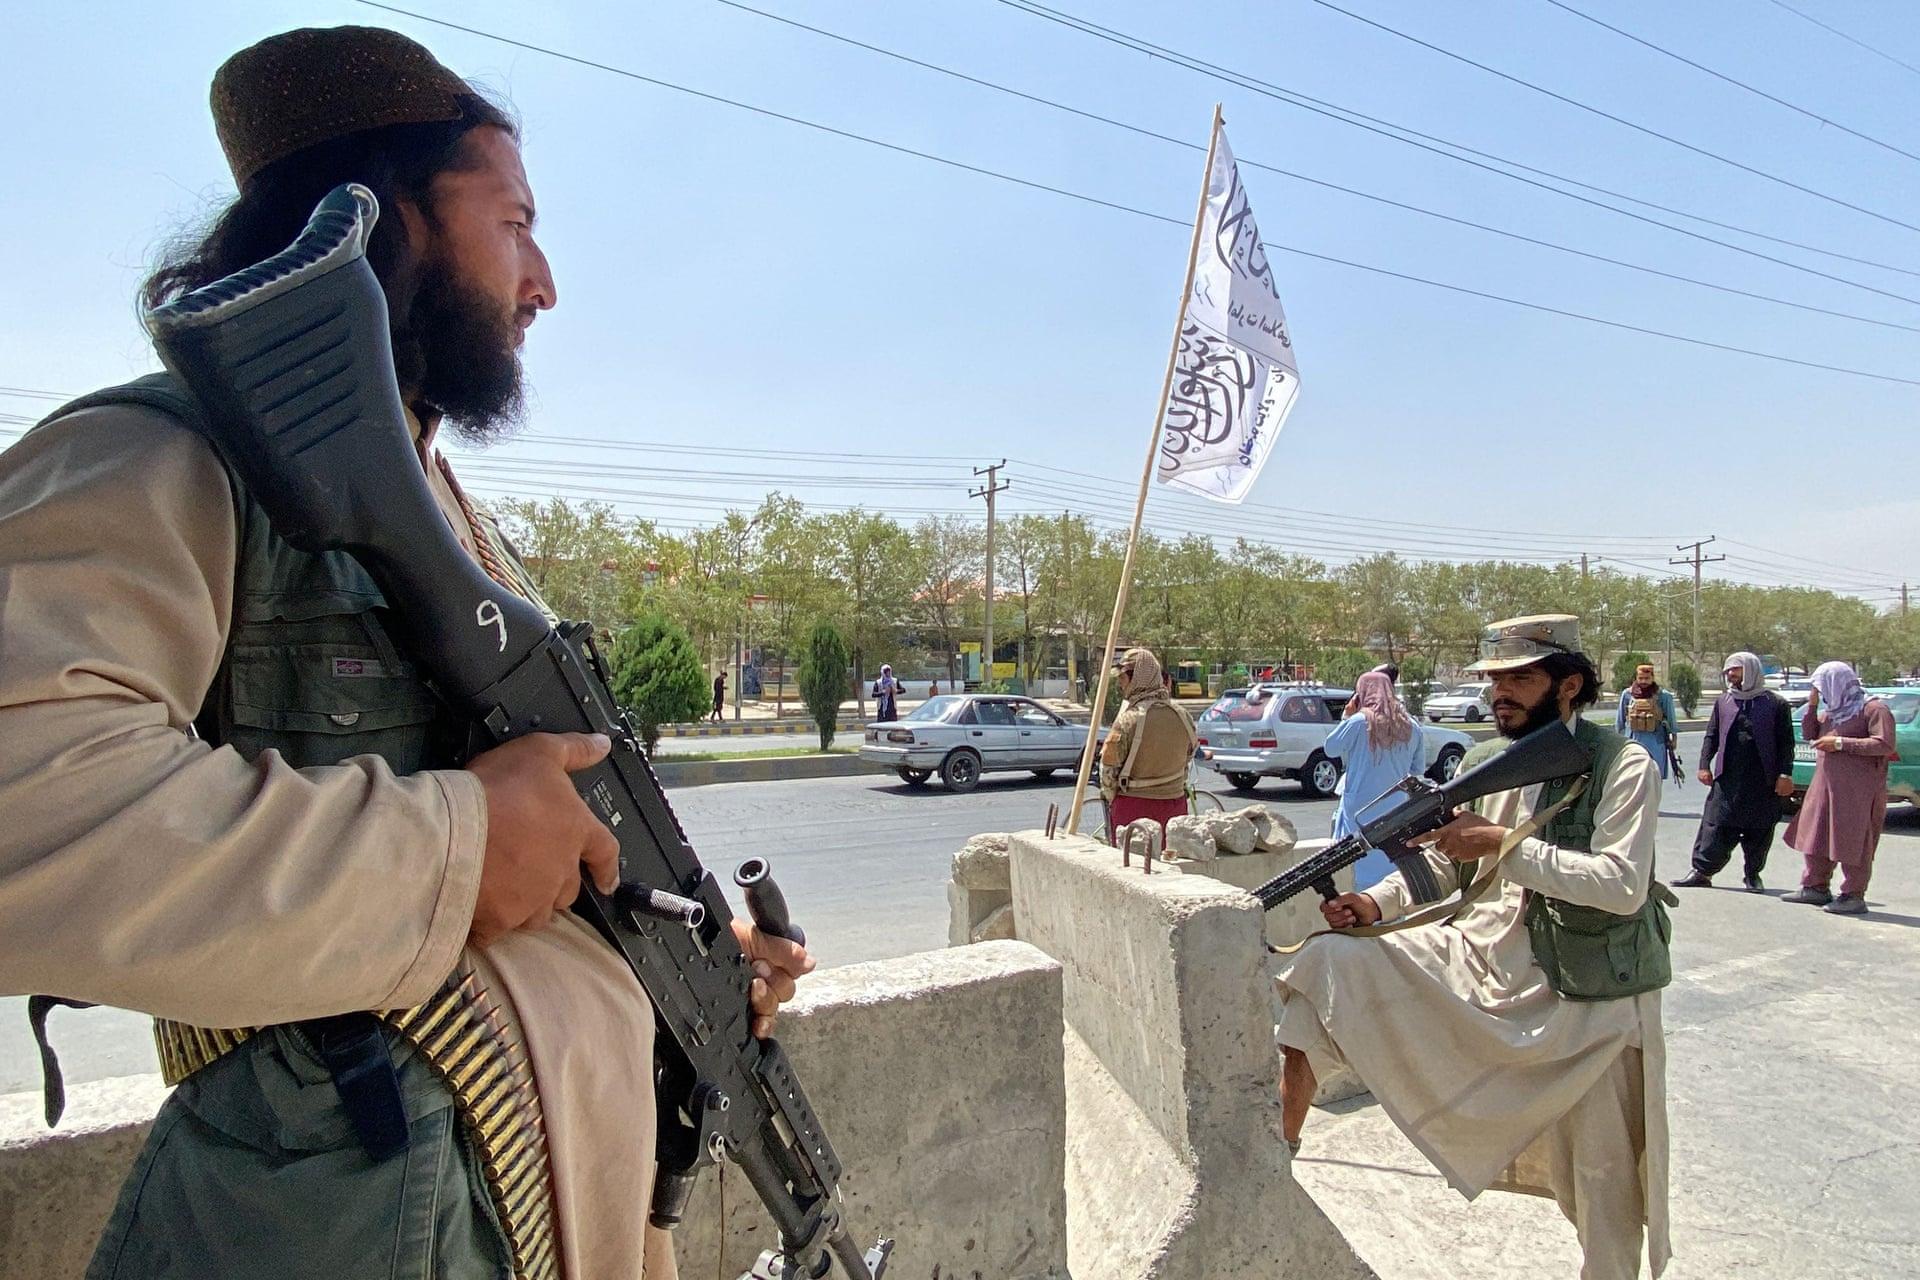 «Талибан» начал охоту на афганцев, которые сотрудничали с НАТО — BBC